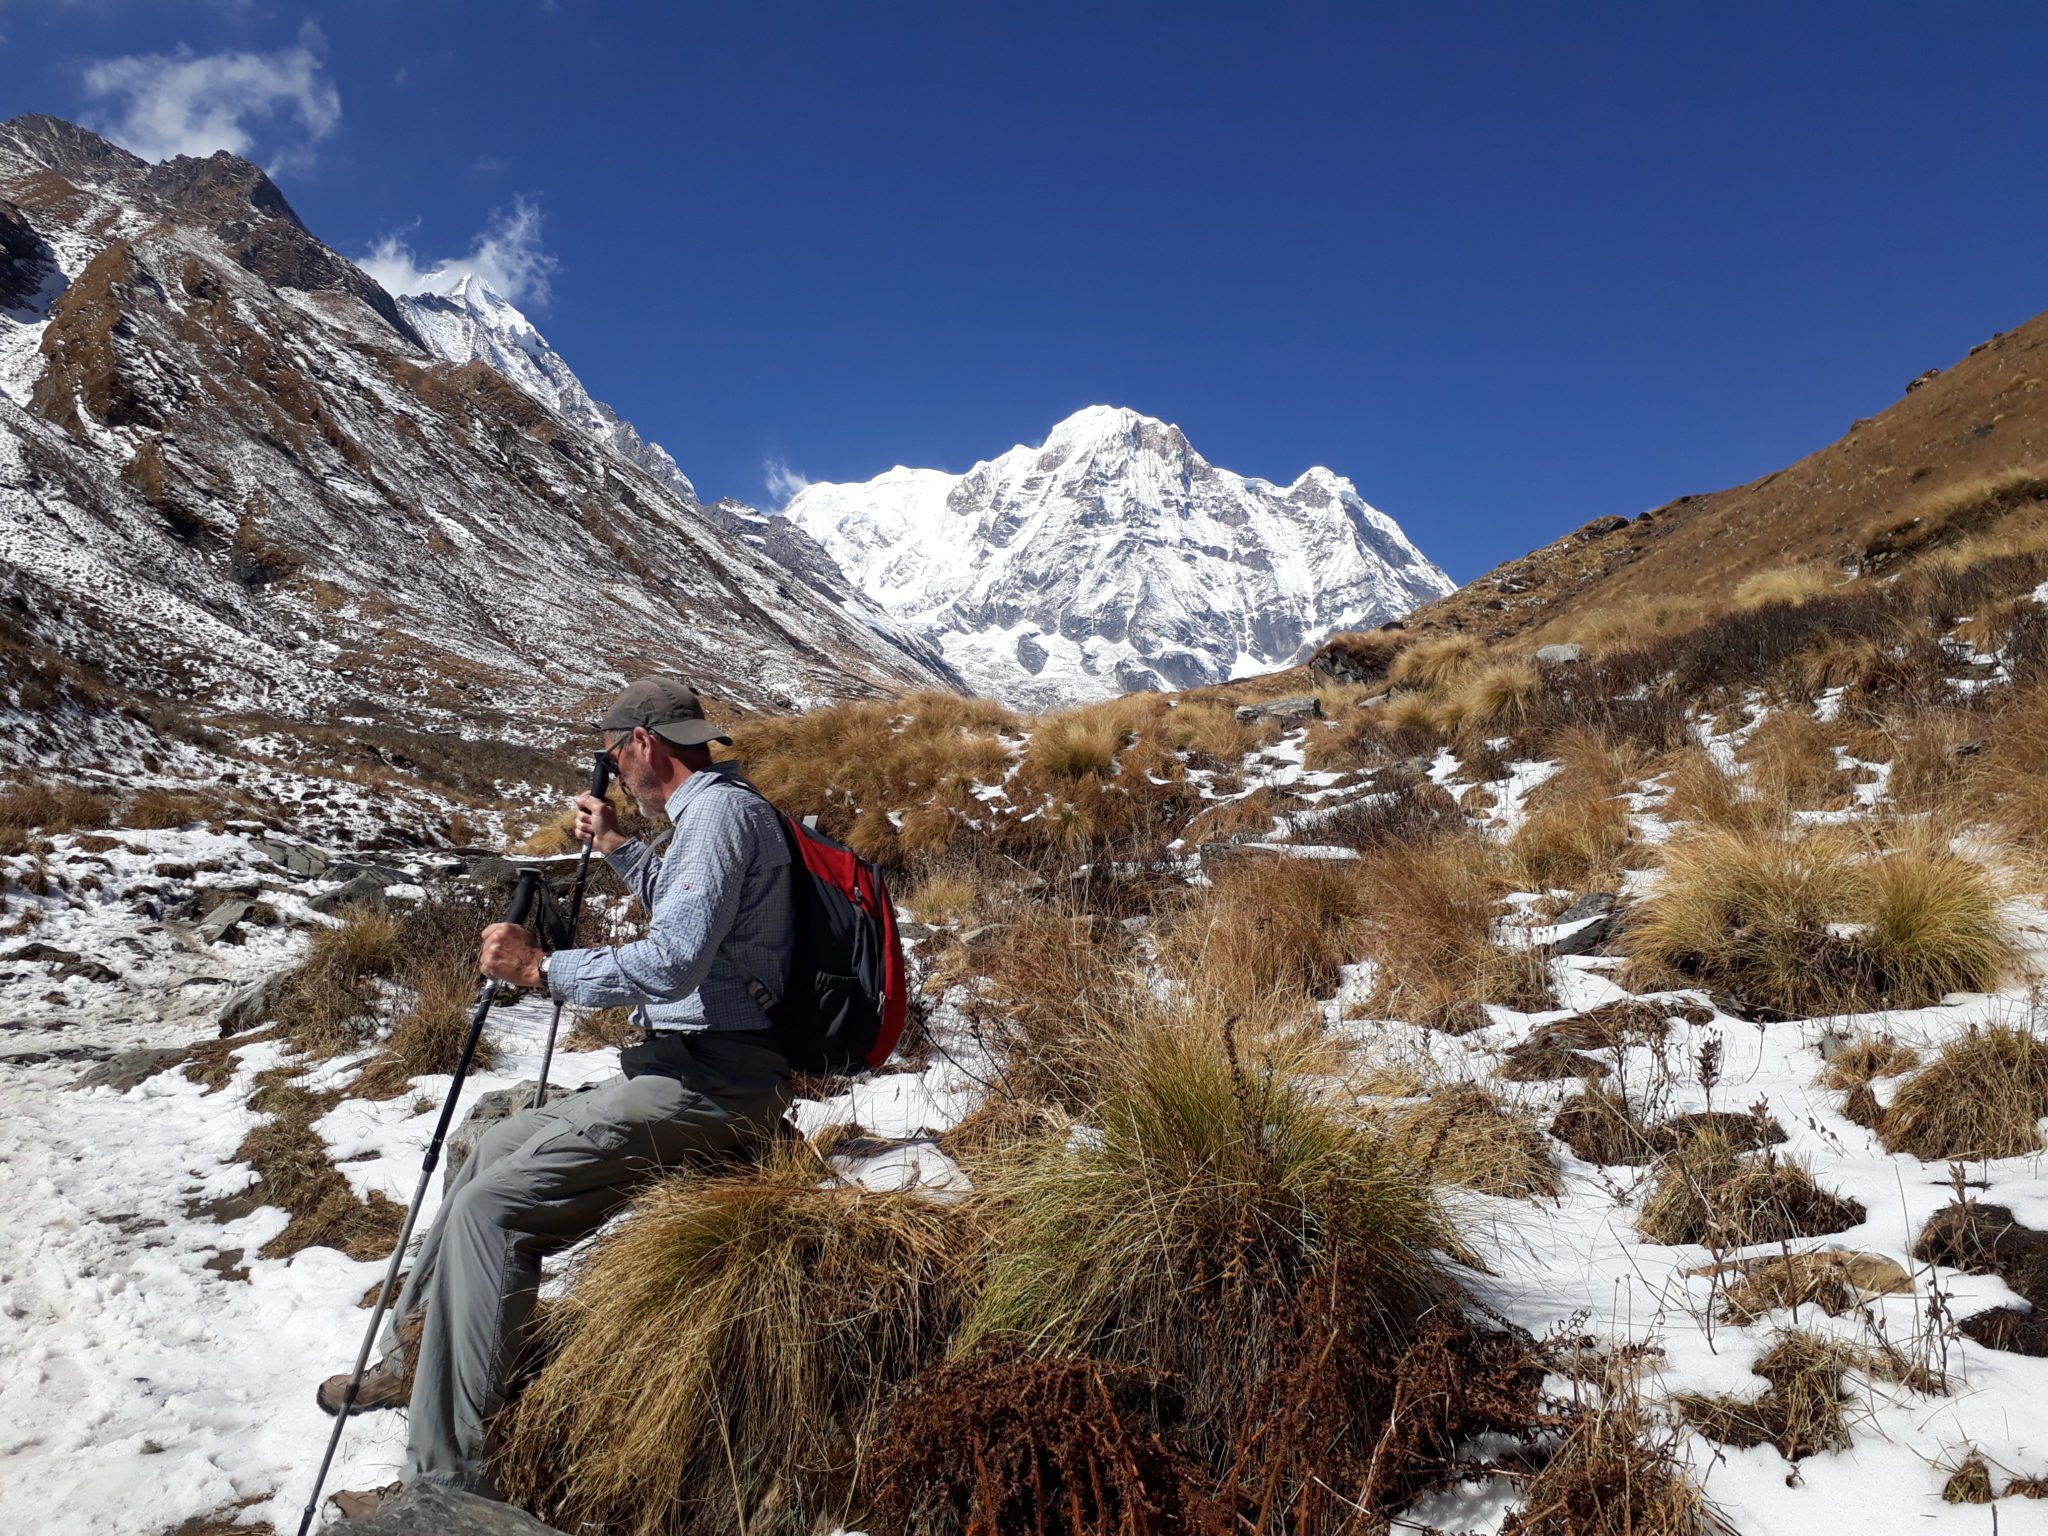 Trek to Annapurna Base camp: Himalaya trekking adventure in Nepal